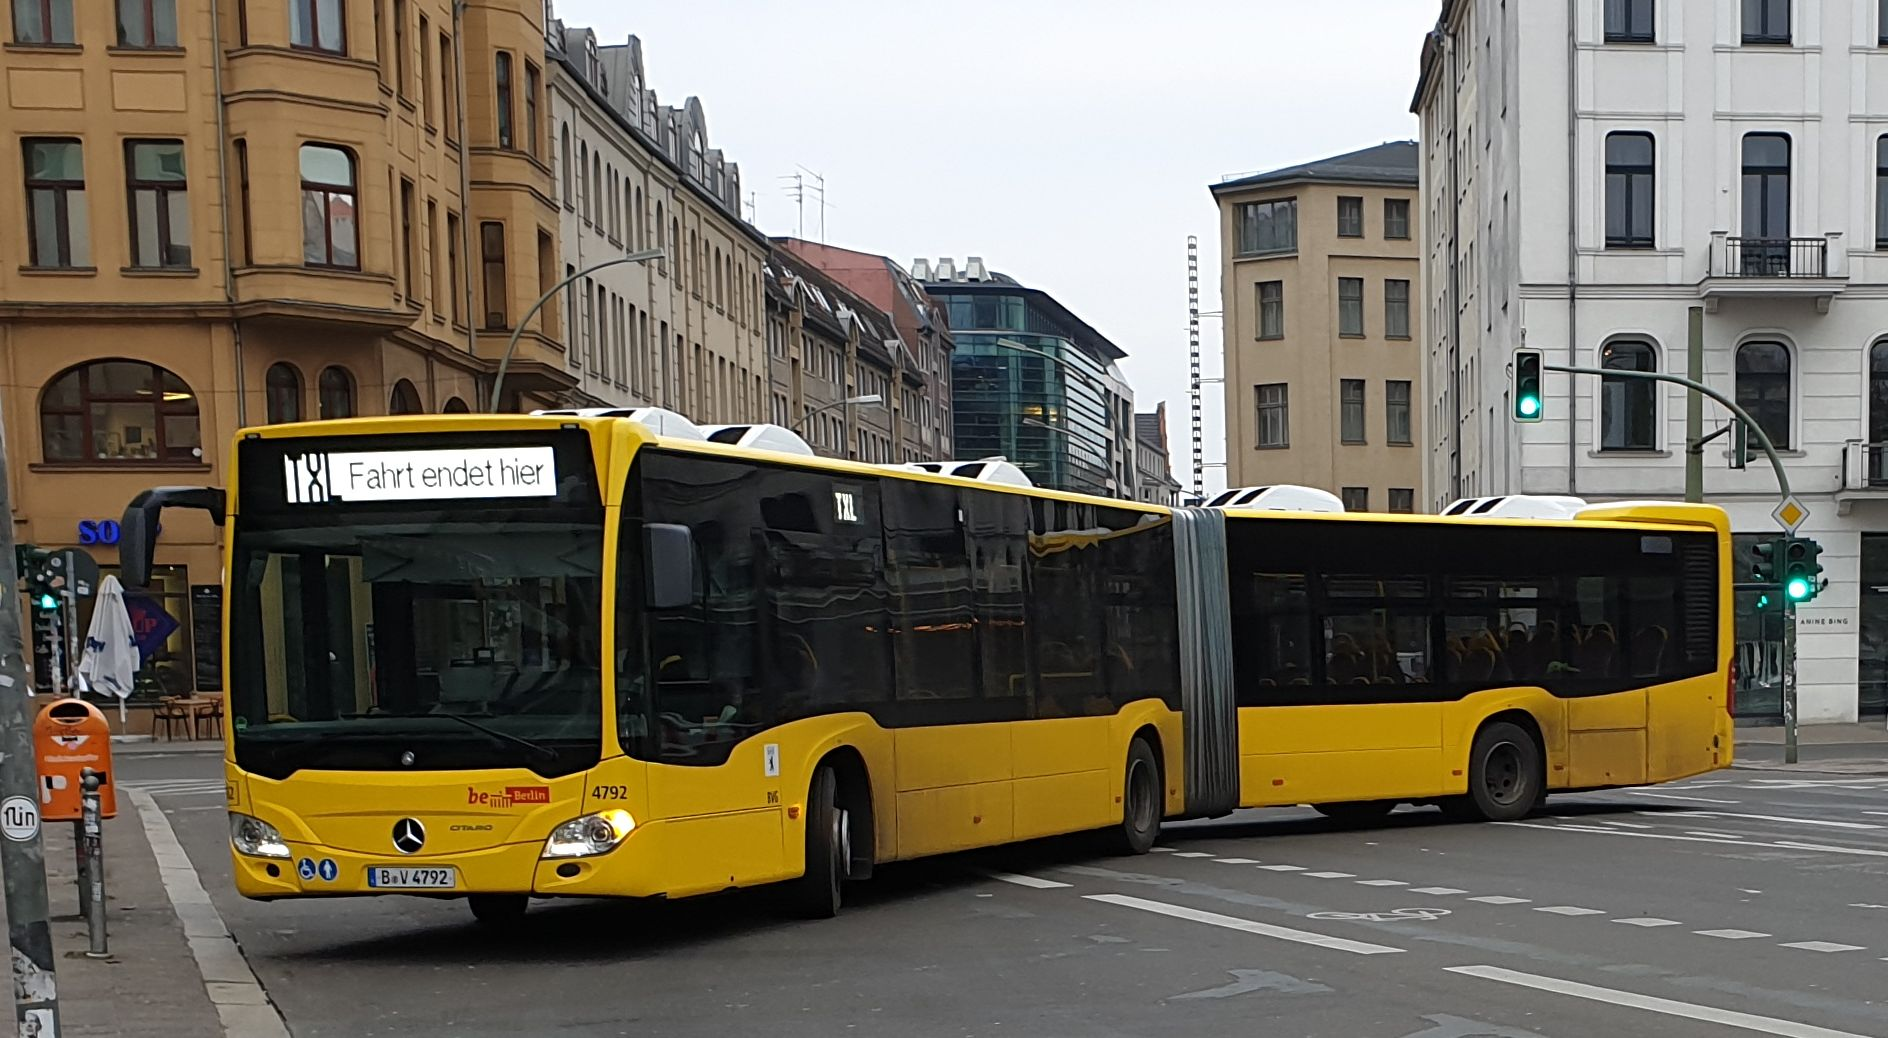 Foto: Bus 4792, Gelenkbus Typ Mercedes, Alexanderplatz, Januar 2019